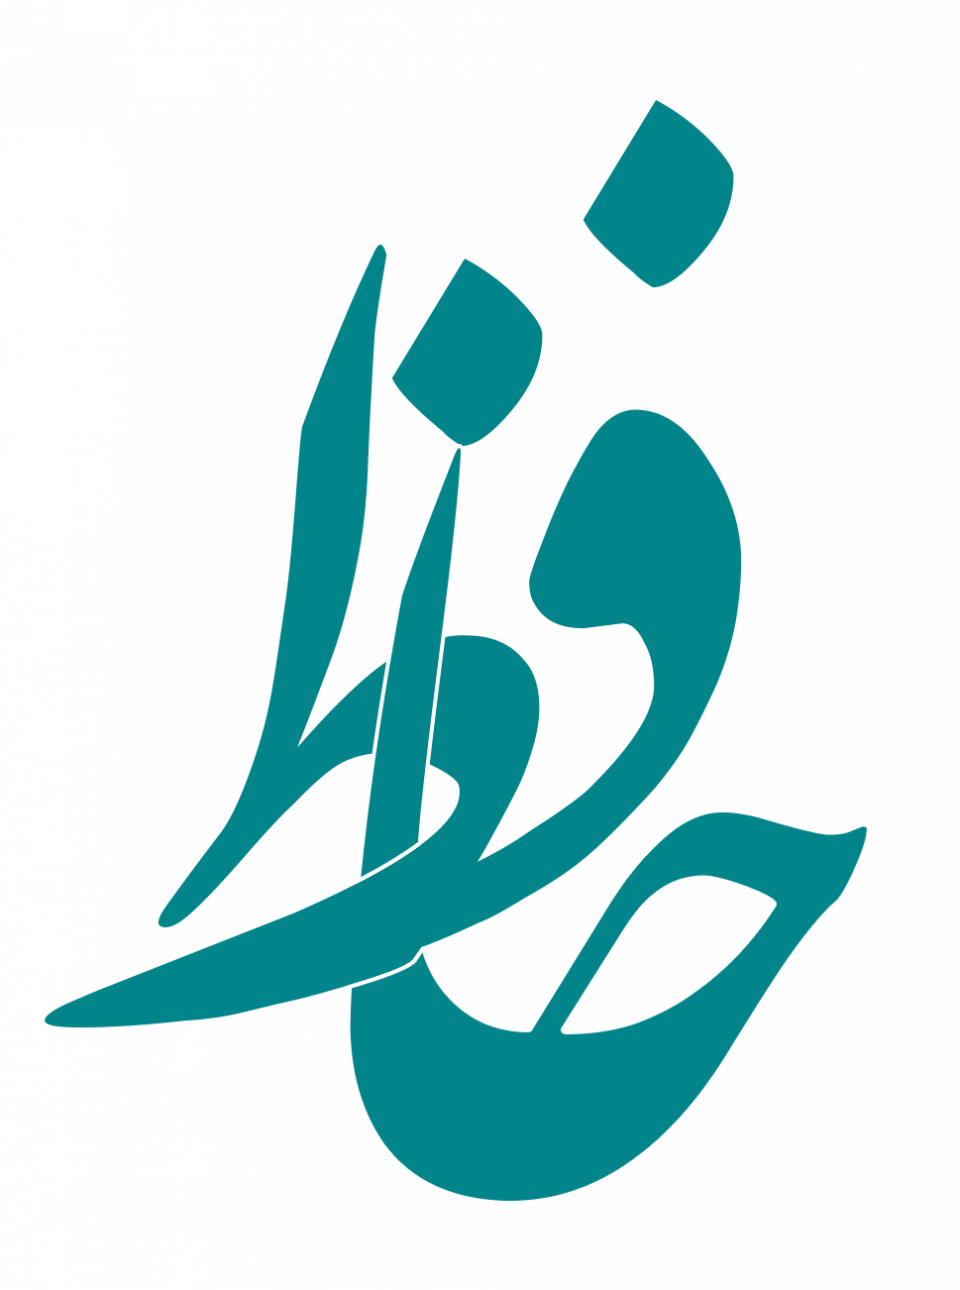 حافظ - شرح غزل